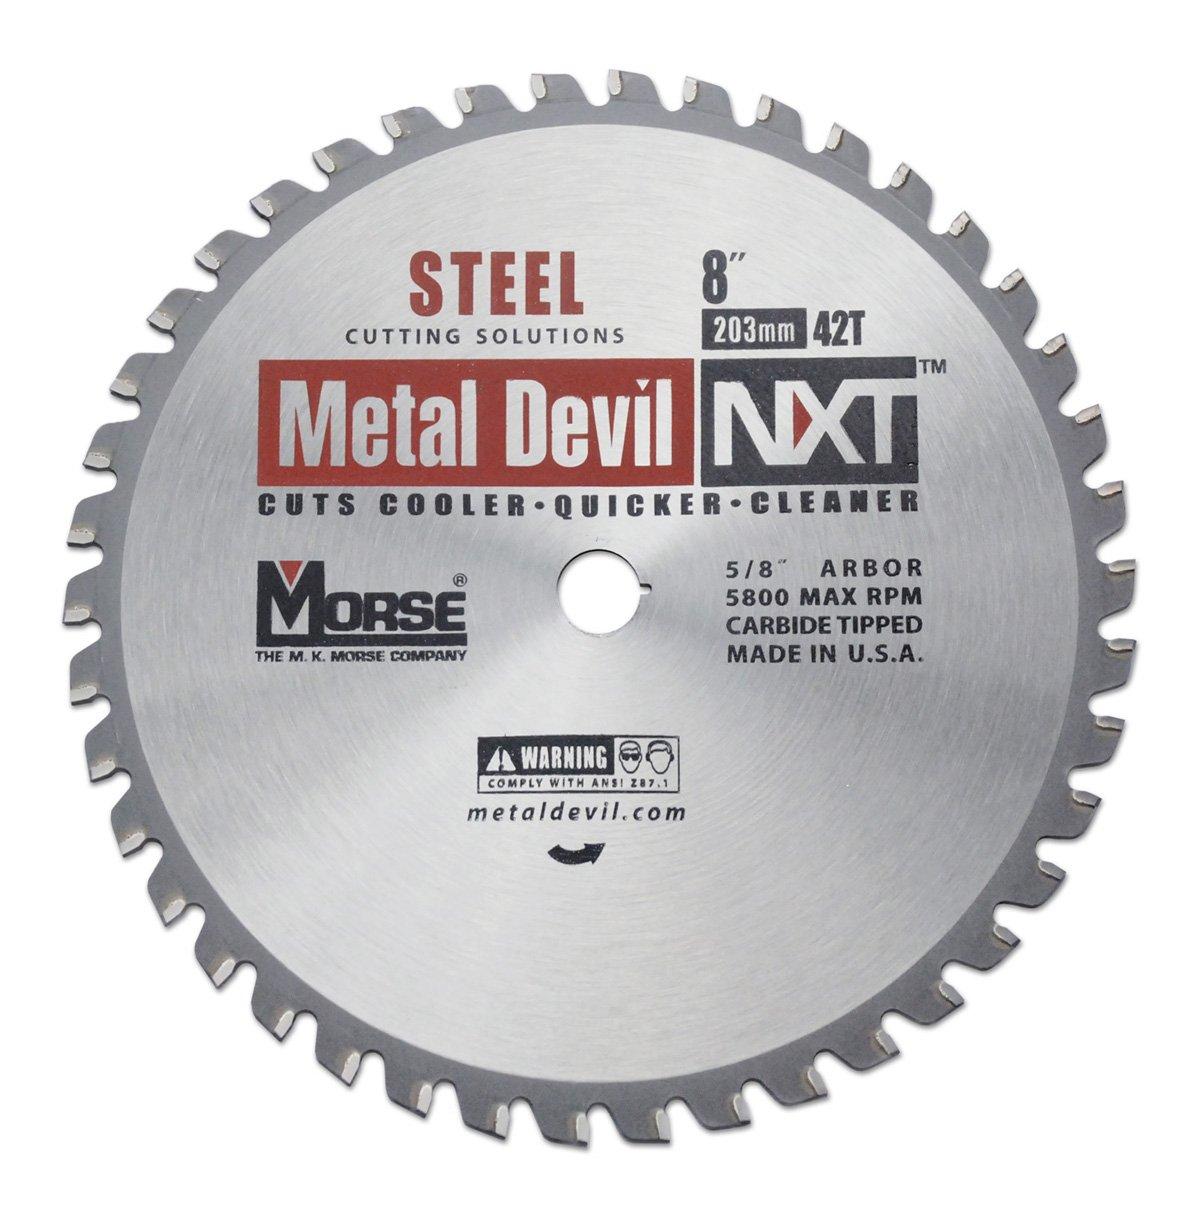 Disco Sierra MK MORSE CSM842NSC Metal Devil NXT 8i Diámetr